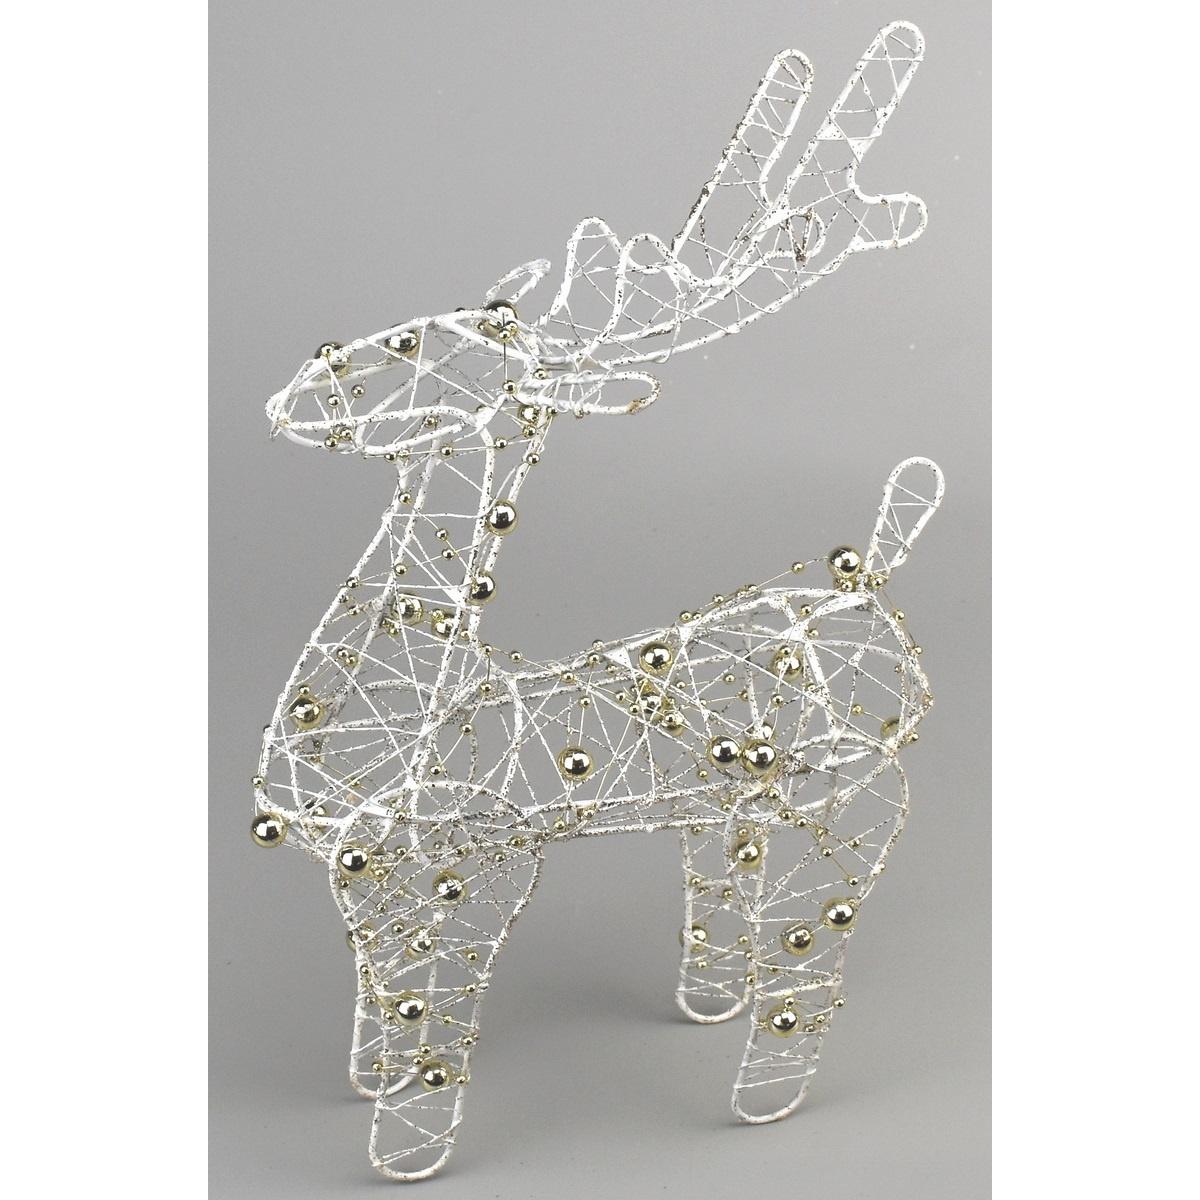 Vánoční dekorace sob Brawley bílá, 20 cm